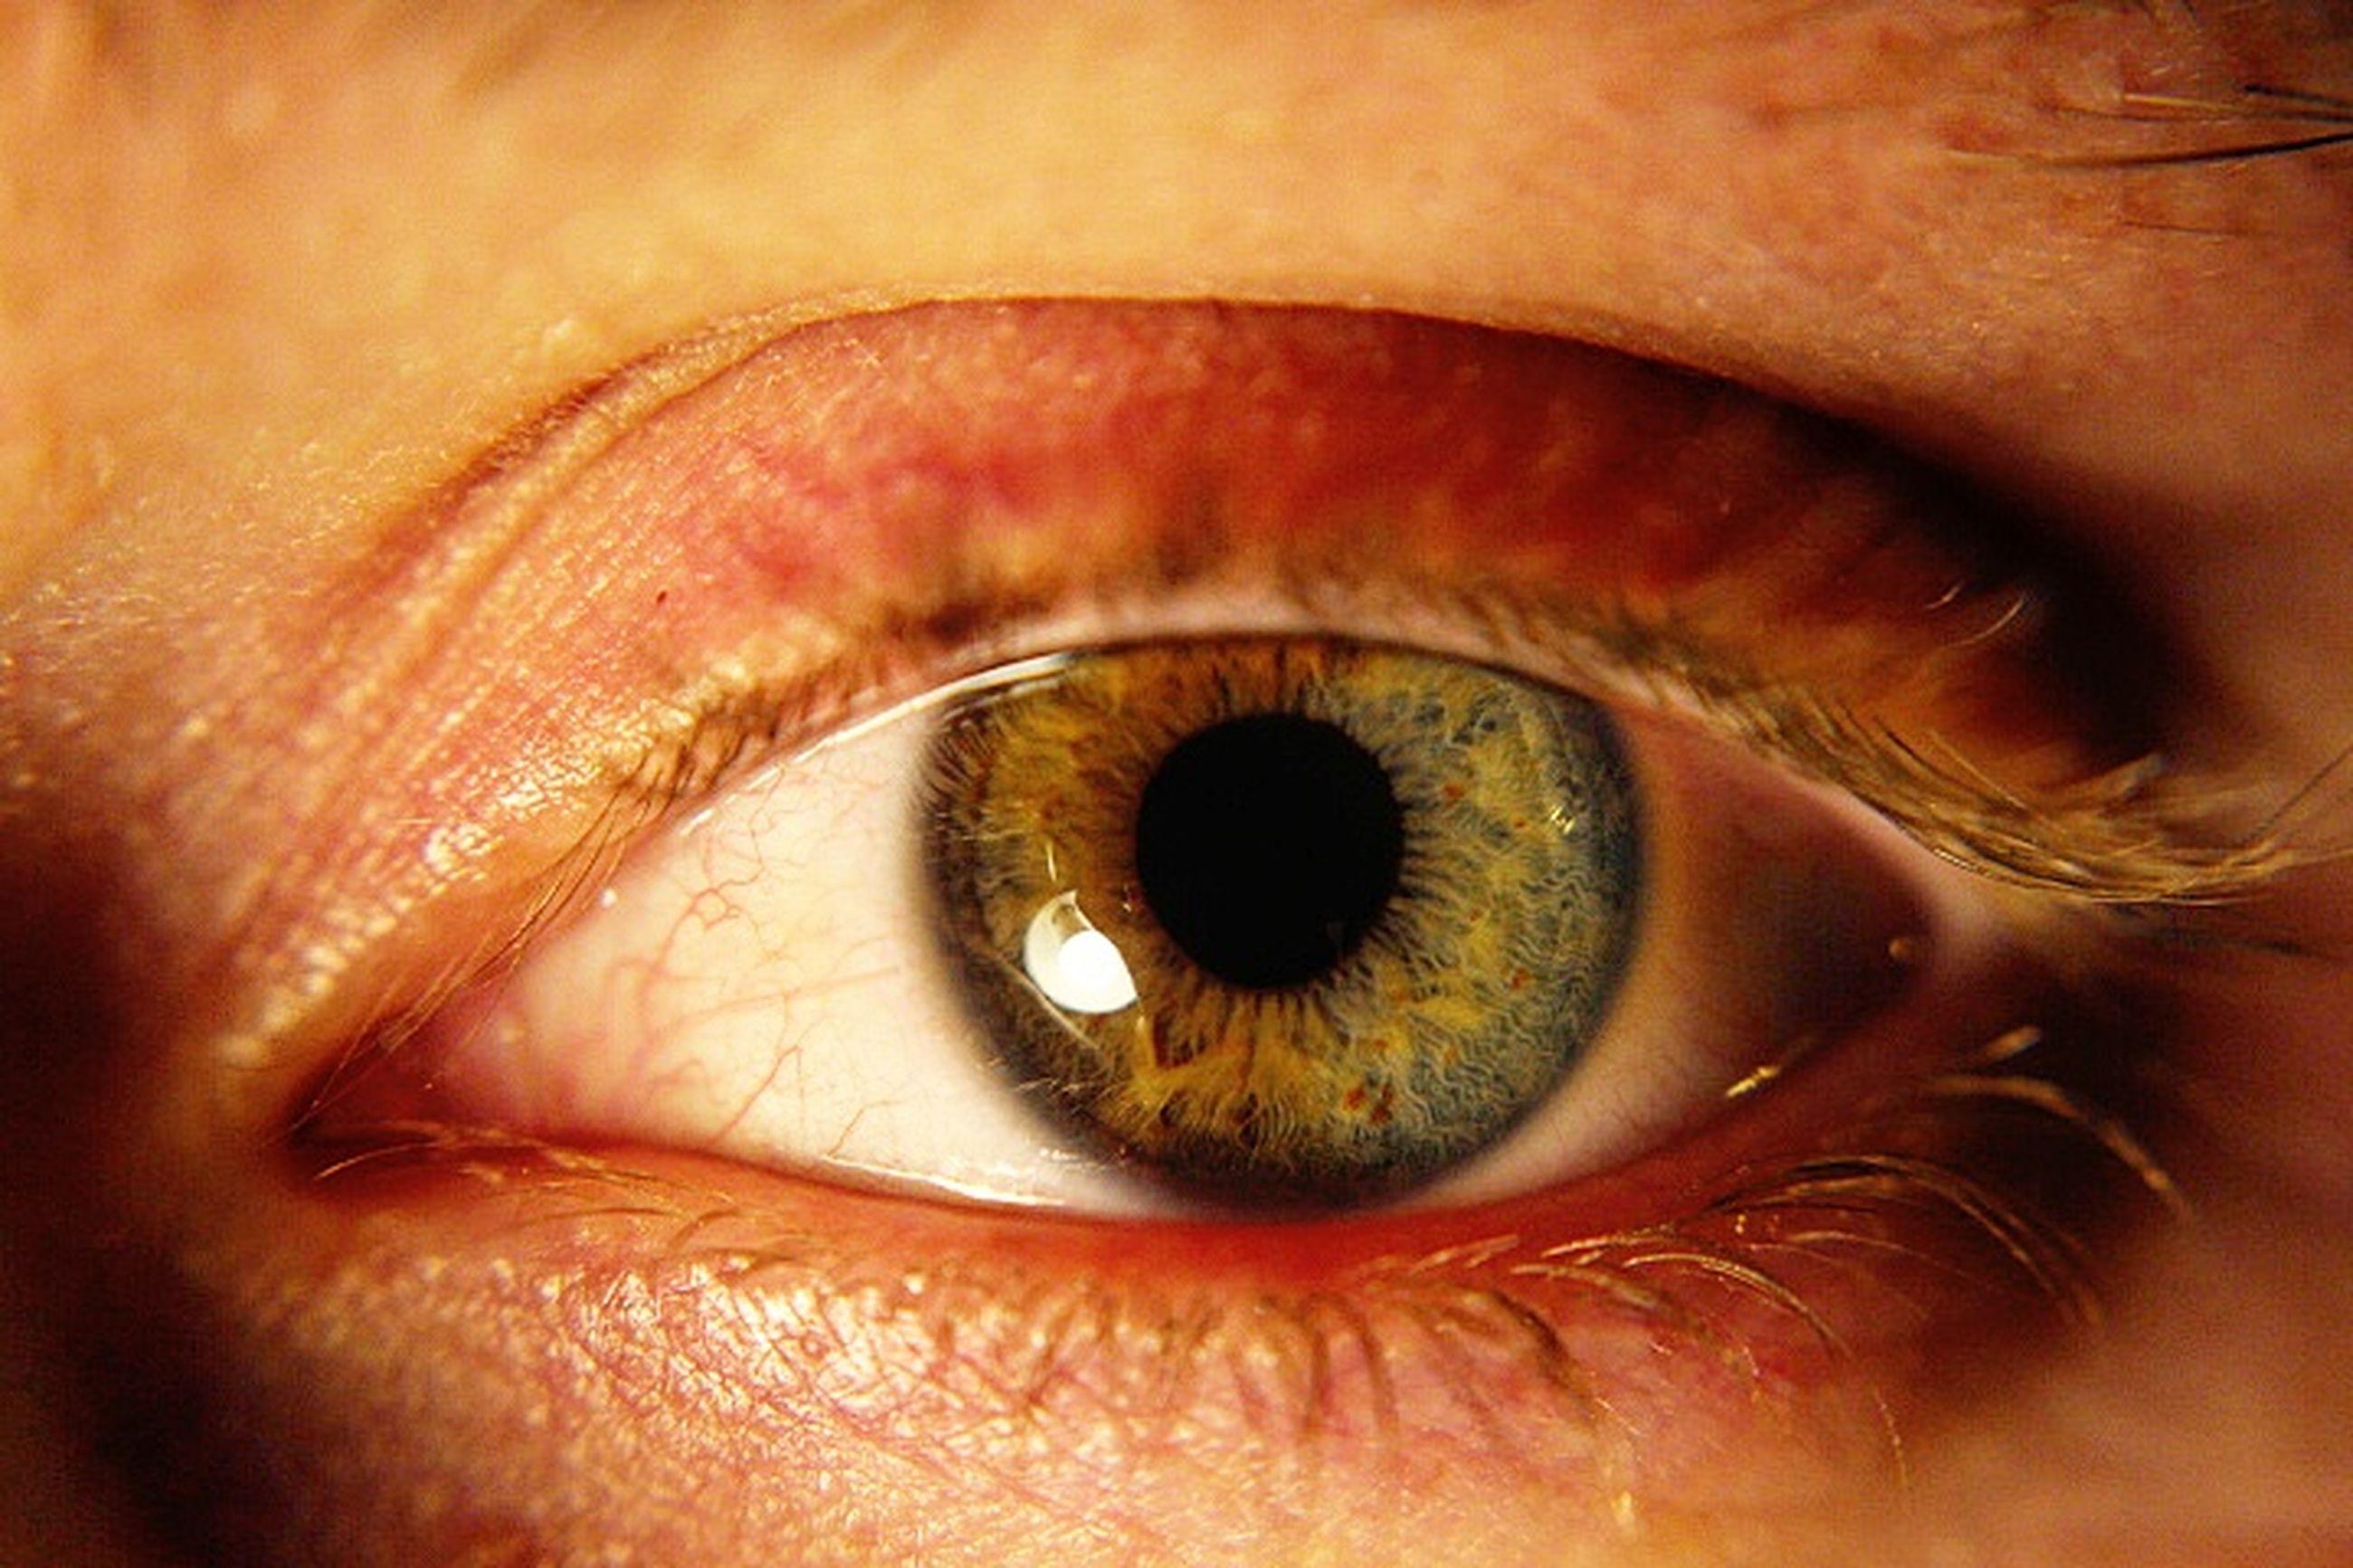 human body part, human eye, eyesight, real people, eyelash, sensory perception, one person, close-up, iris - eye, eyeball, vision, people, outdoors, day, adult